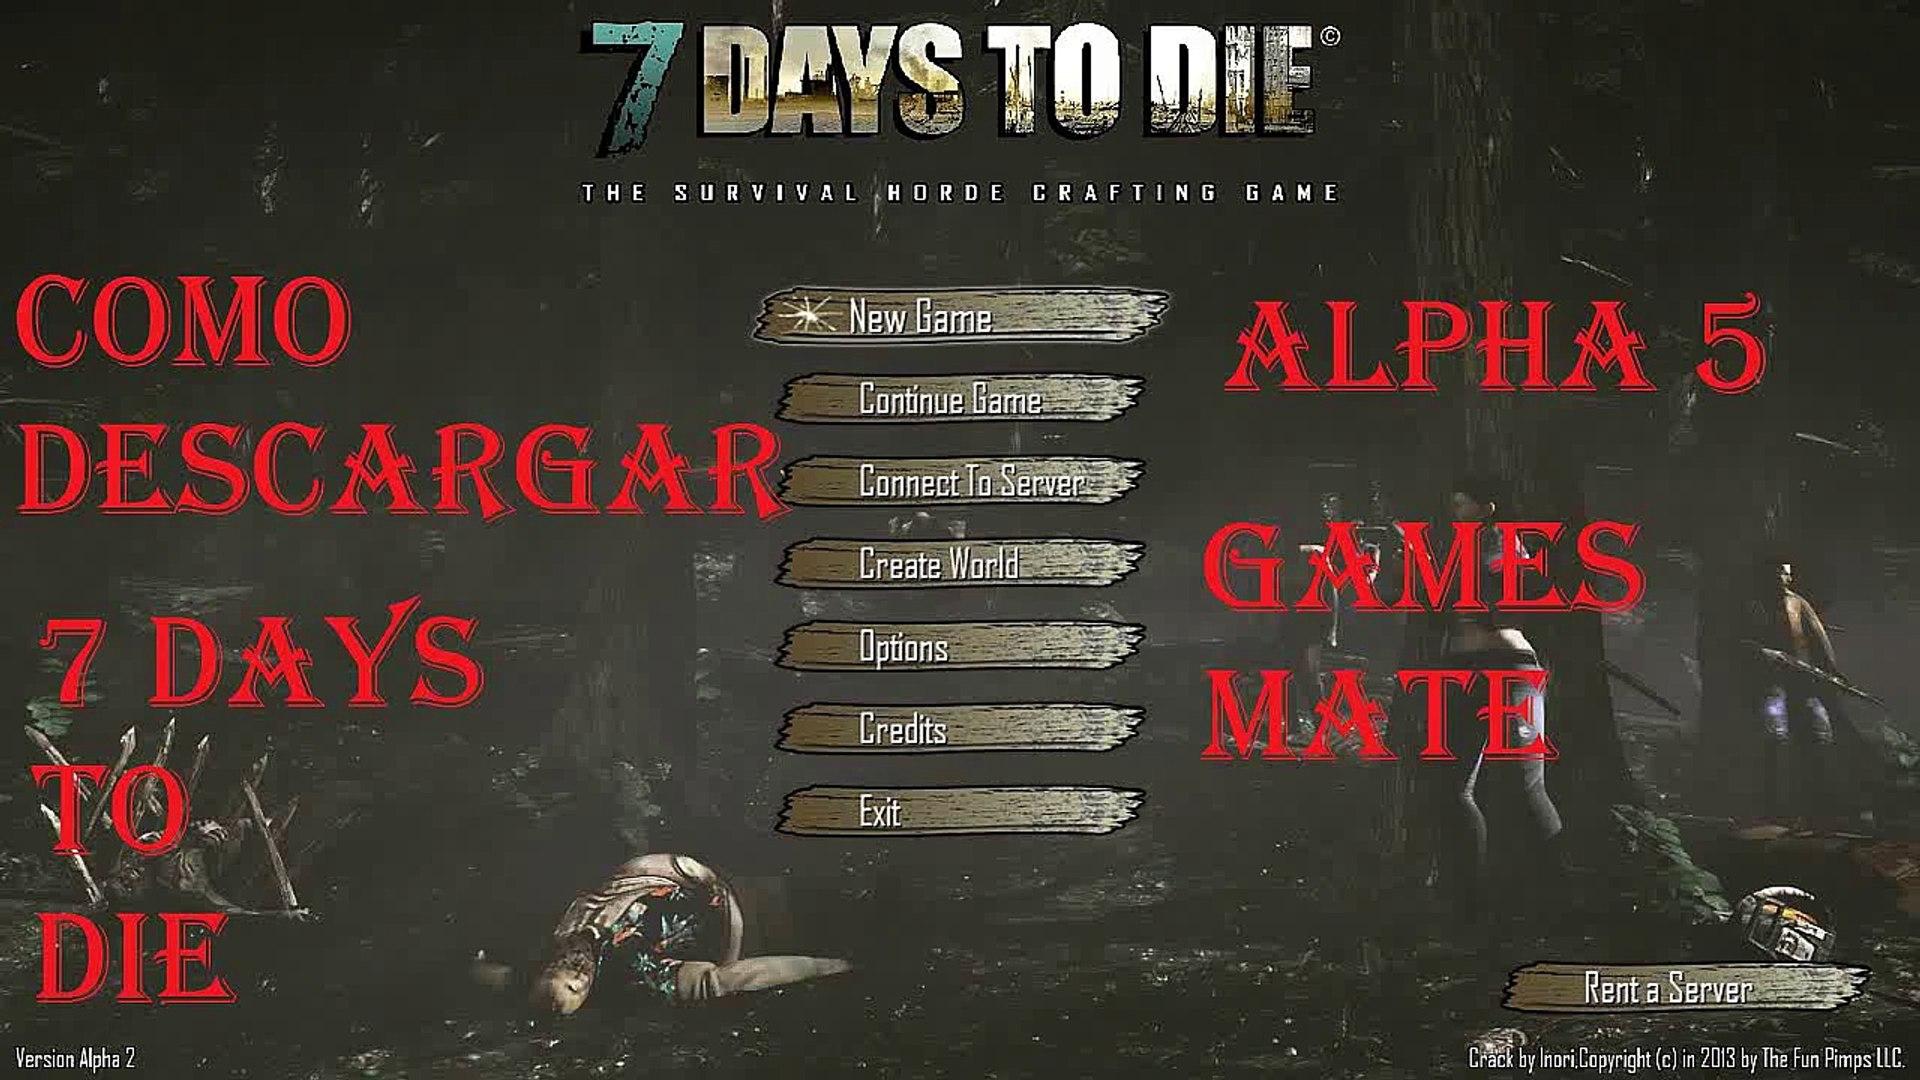 Como Descargar 7 Days To Die Alpha 5